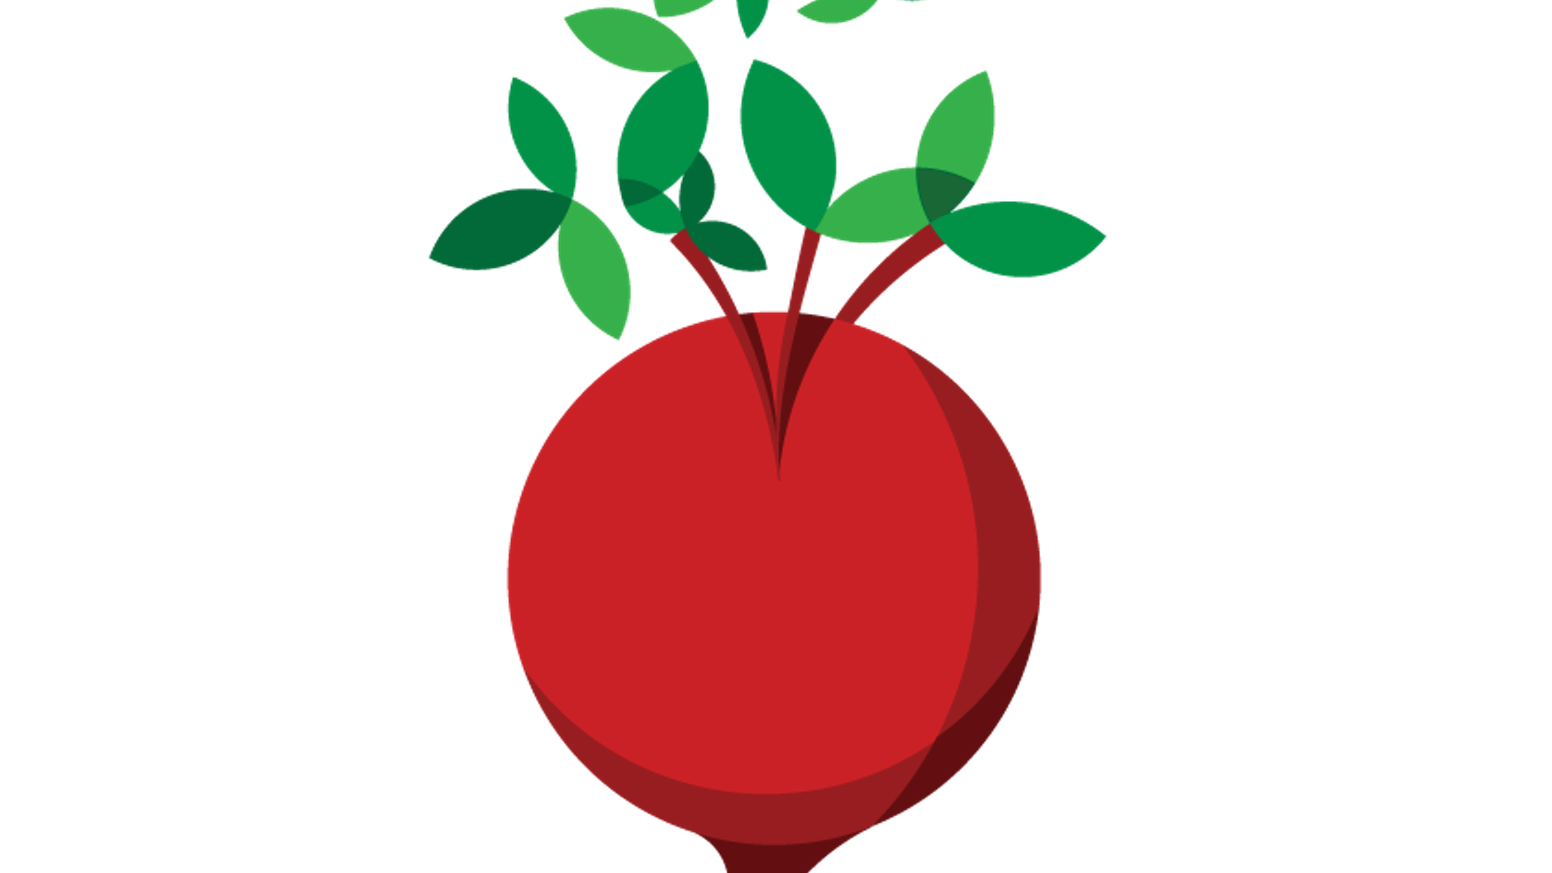 crops clipart radish plant